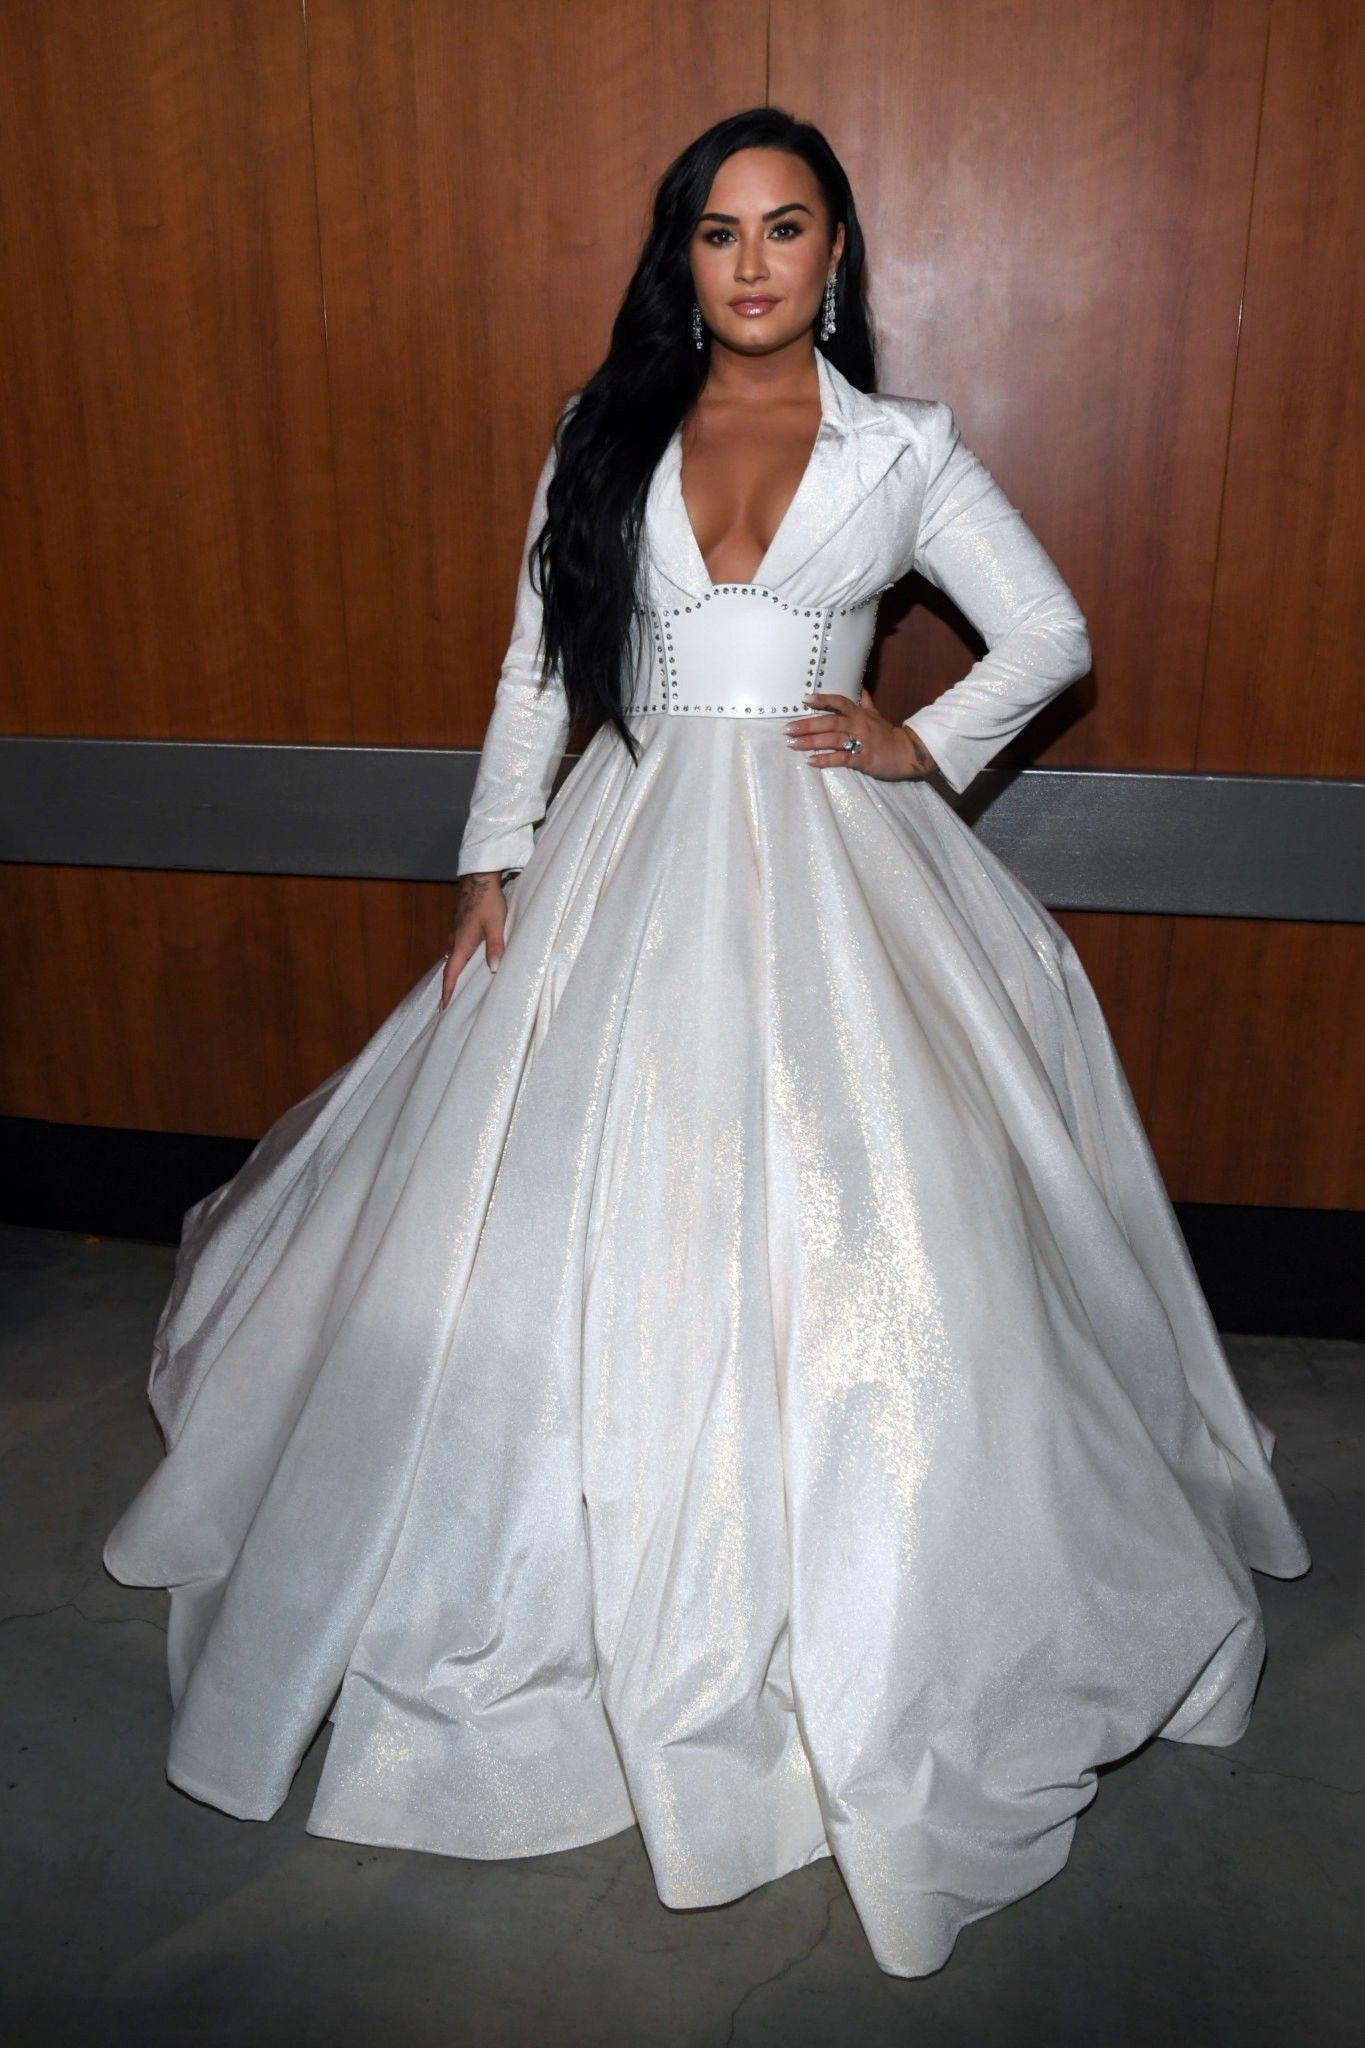 Demi Lovato At Grammys Backstage In 2020 Demi Lovato Style Demi Lovato Style Outfits Demi Lovato Pictures